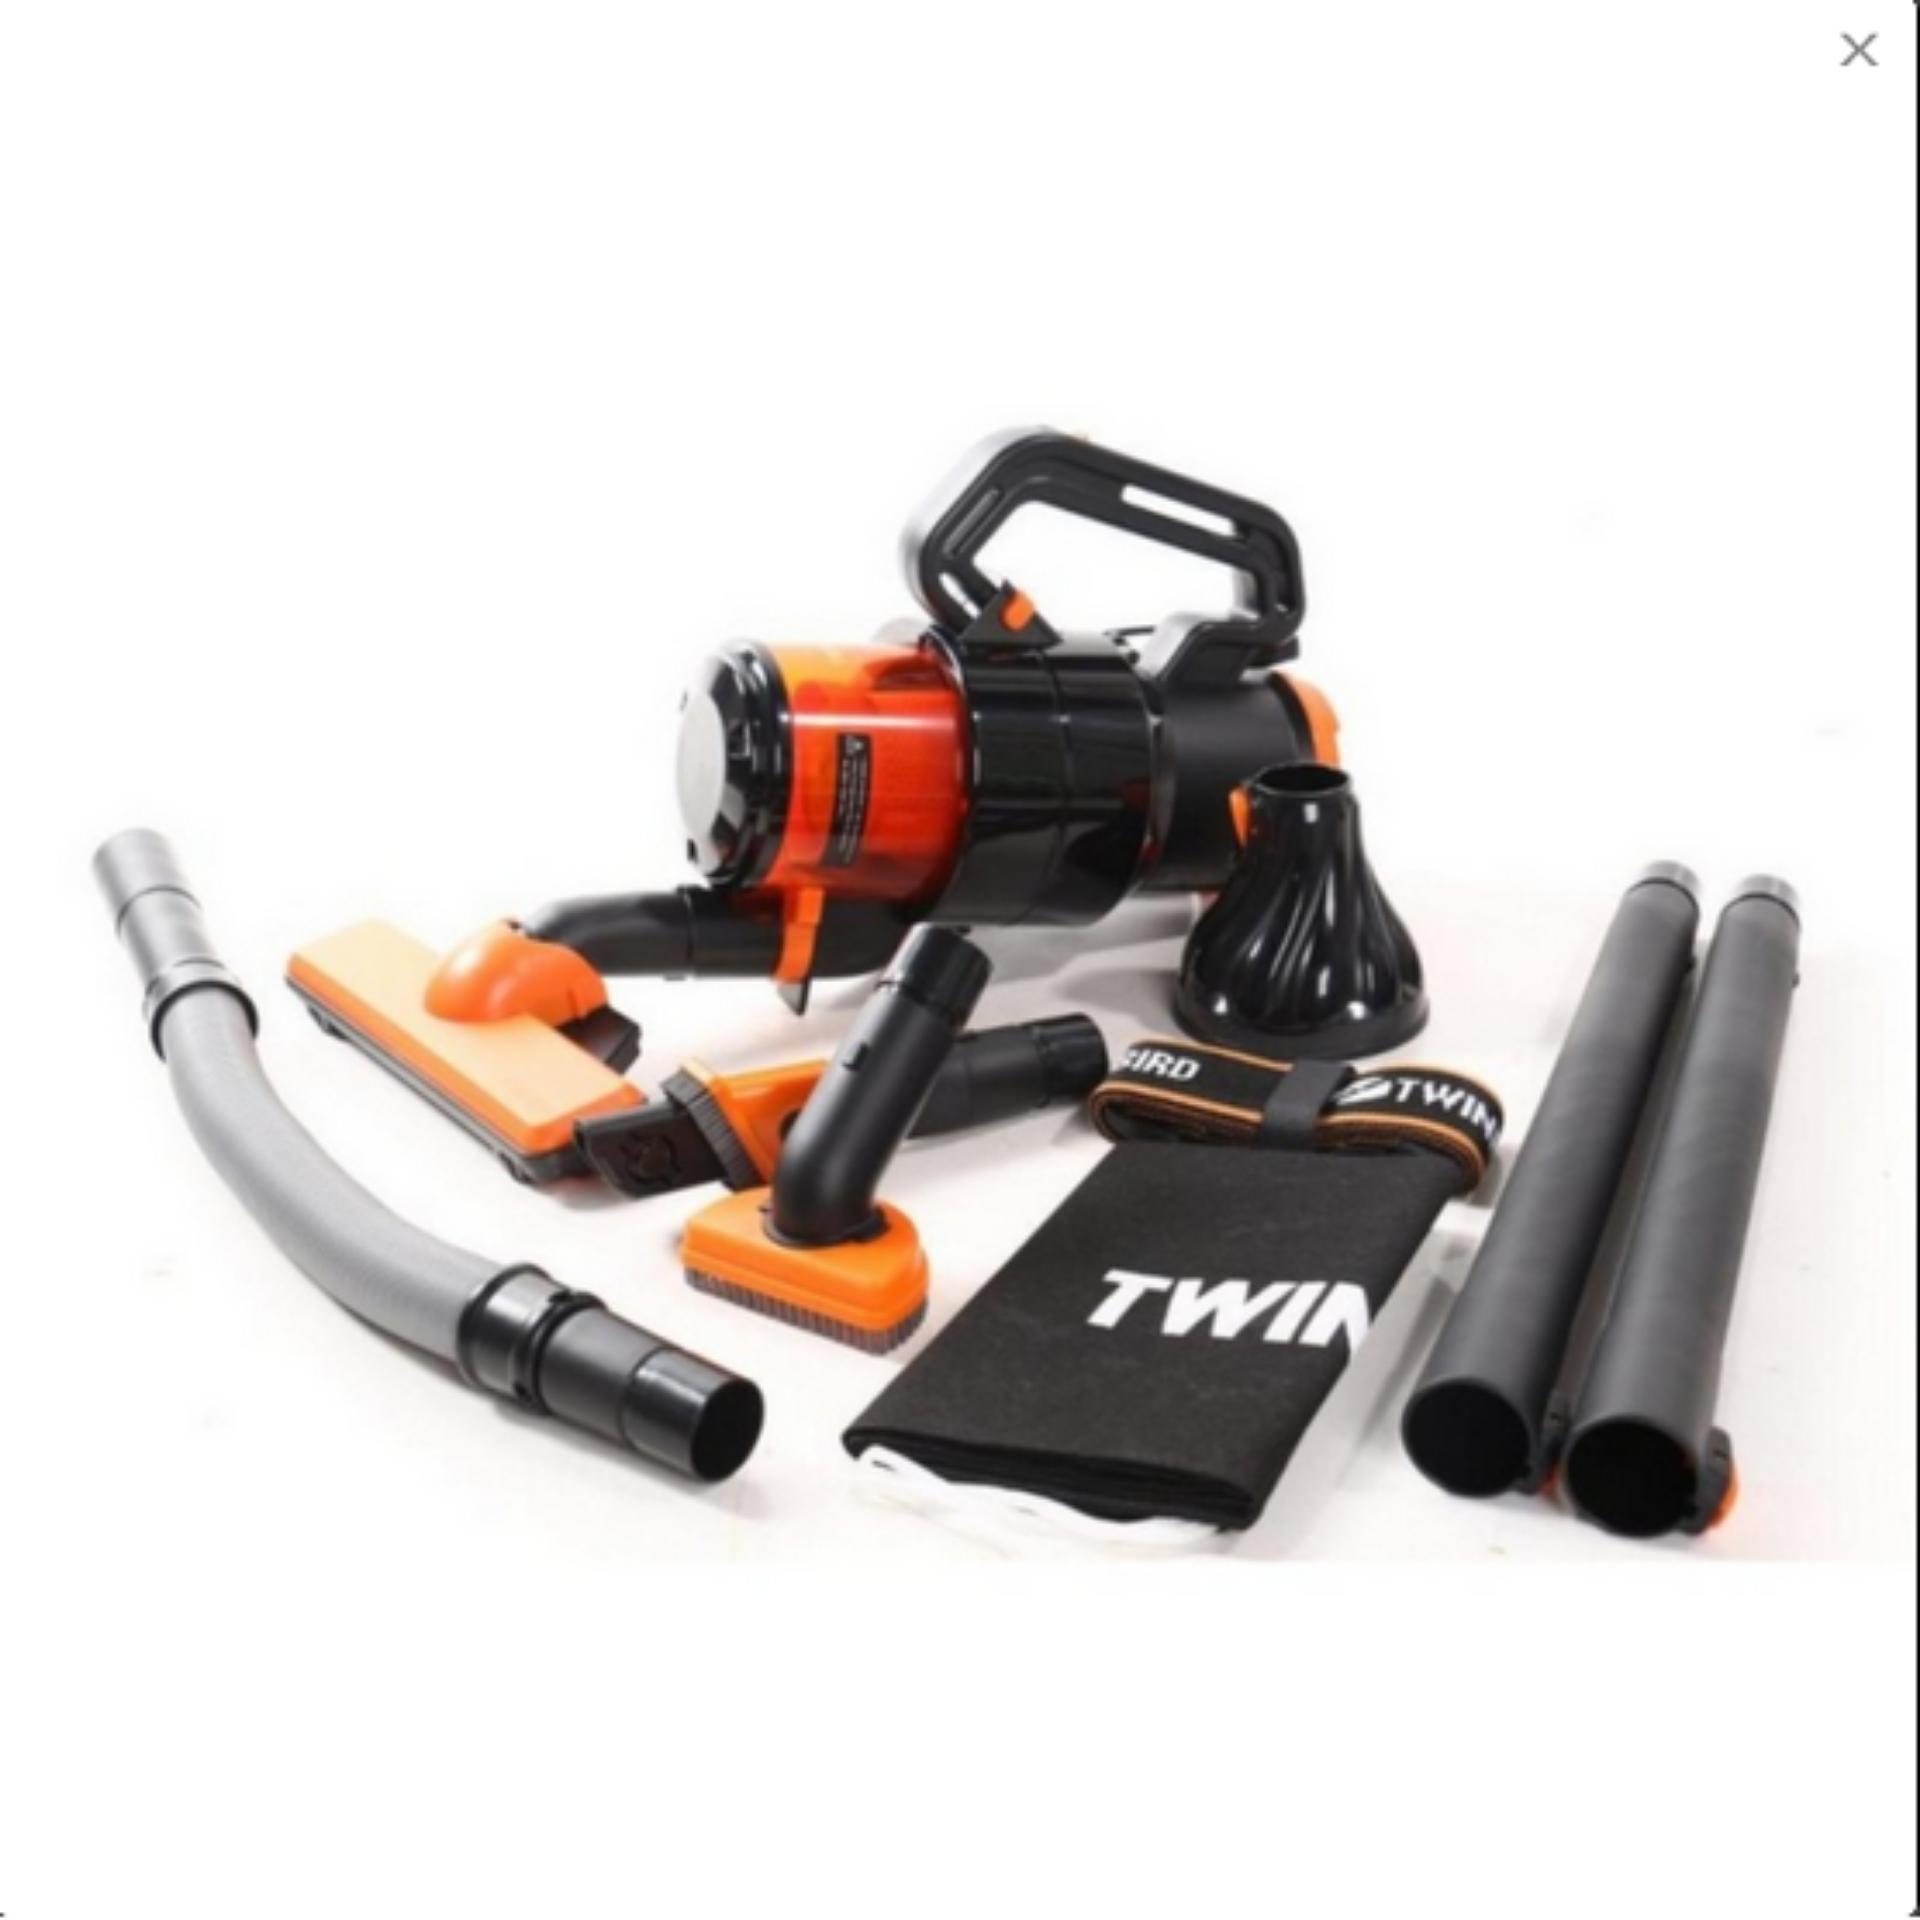 Perbandingan Harga Twinbird Vacuum Cleaner Penyedot Debu Orange 100w Mesin Hitam